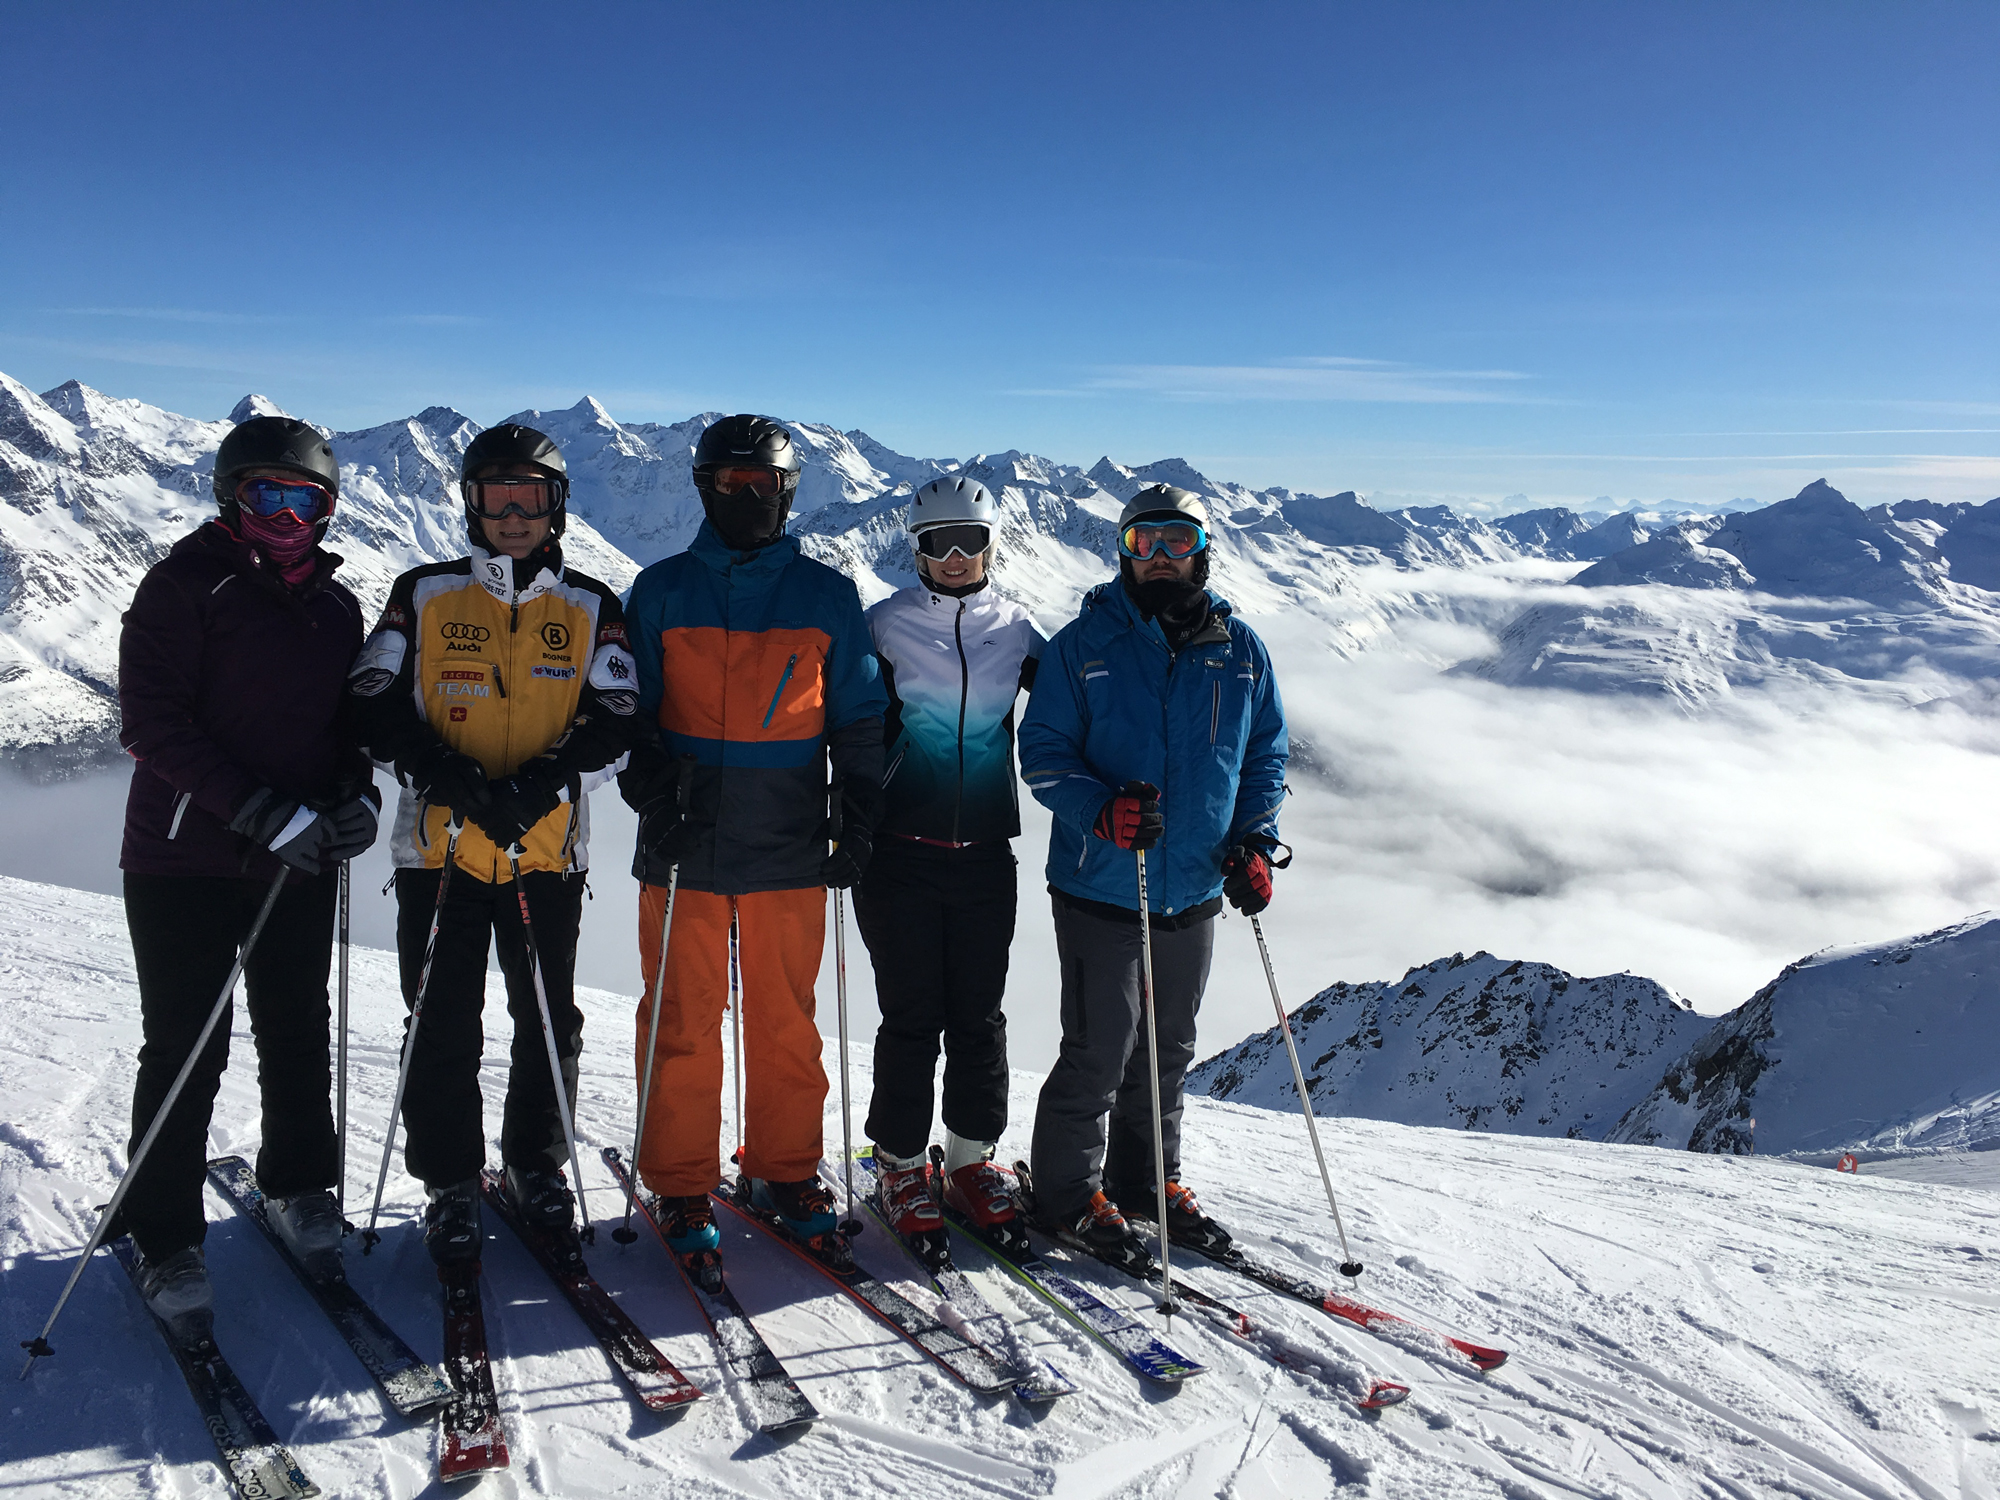 DHG Ski-Event 2020 Terminiert: 21. – 25. Januar